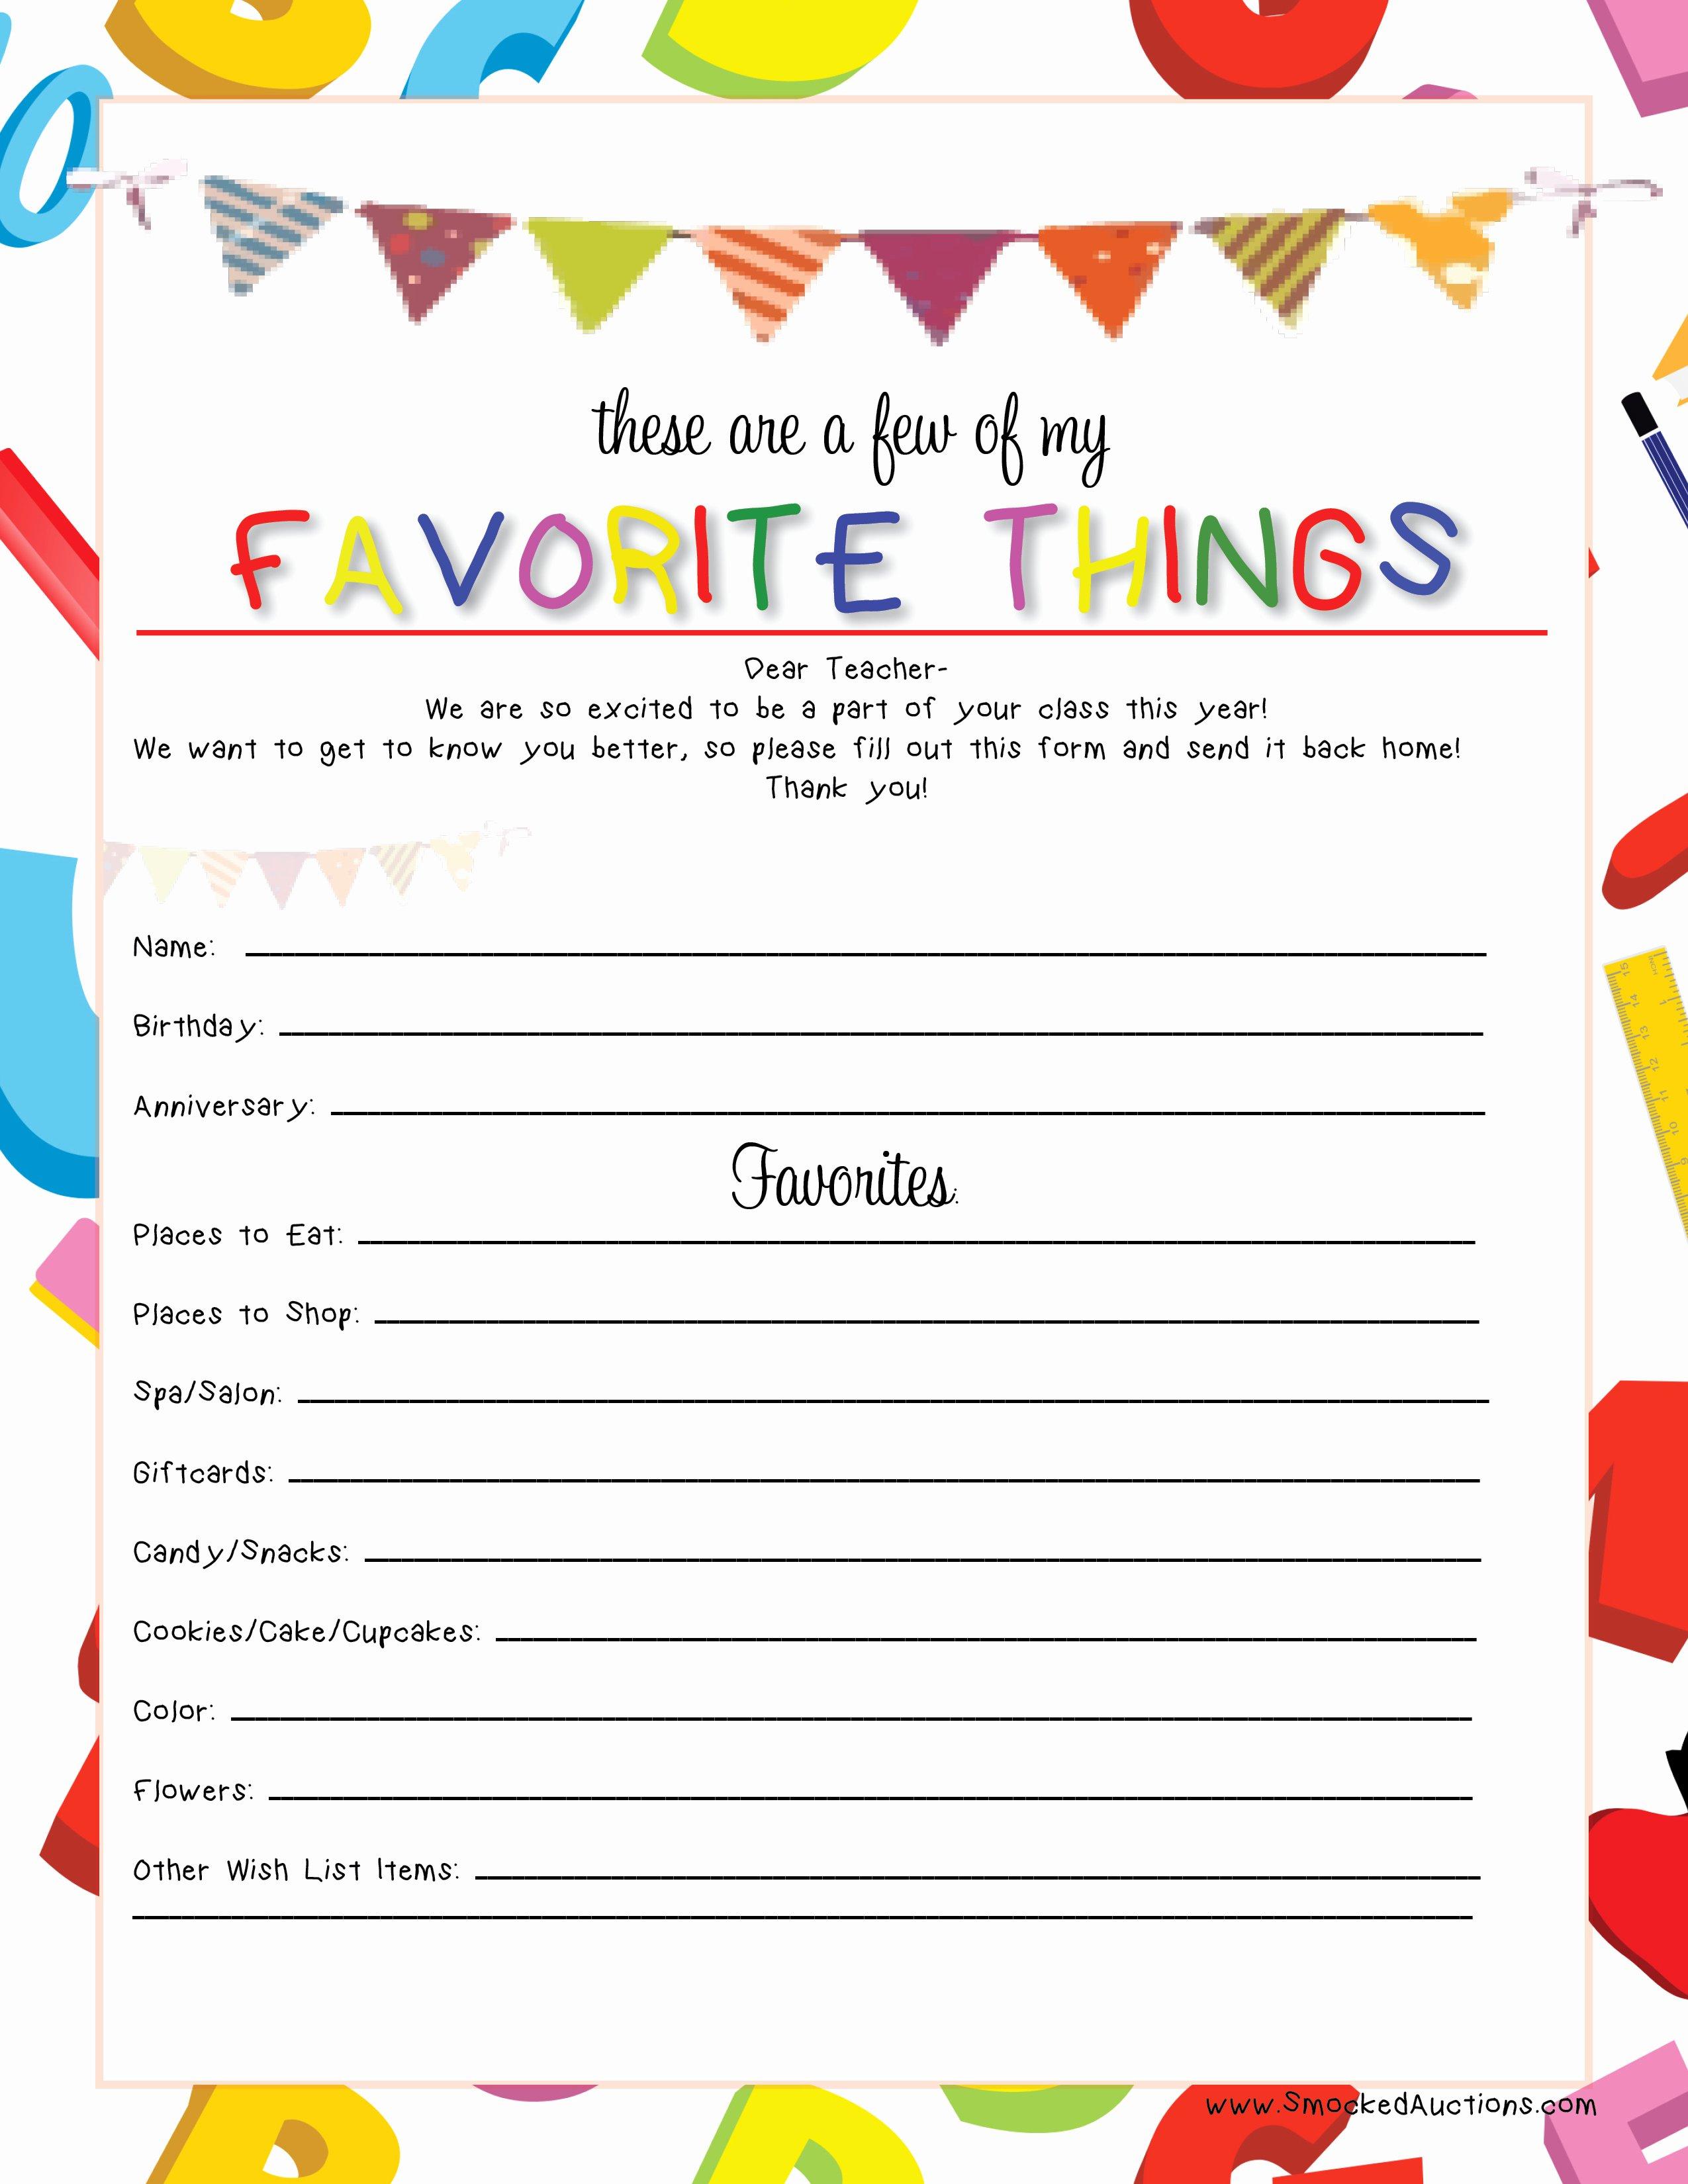 My Favorite Things List Template Elegant Smocked Auctions Blog Teacher S Favorite Things